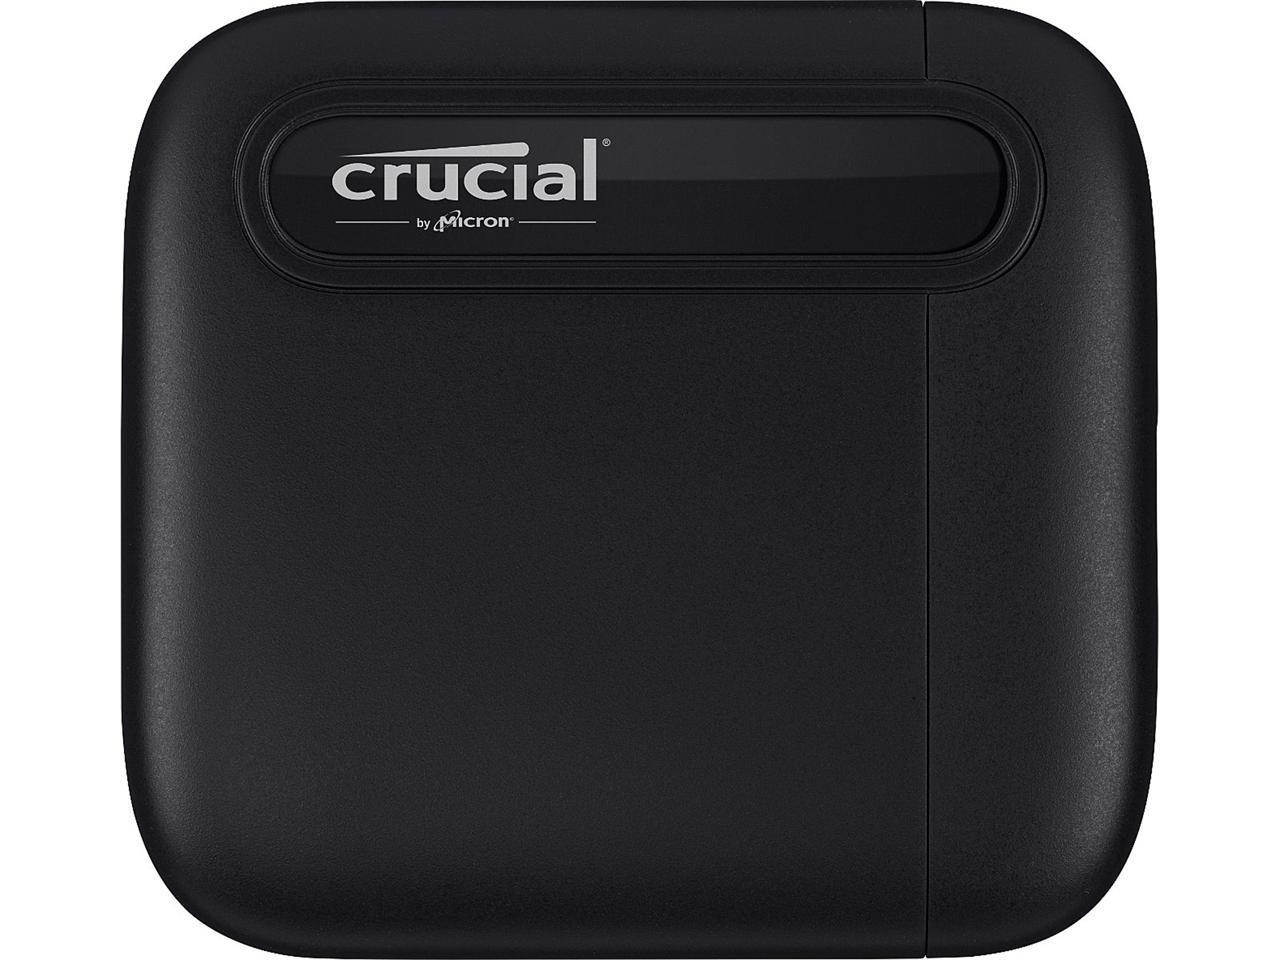 Crucial X6 500GB Portable SSD $50.99 Newegg